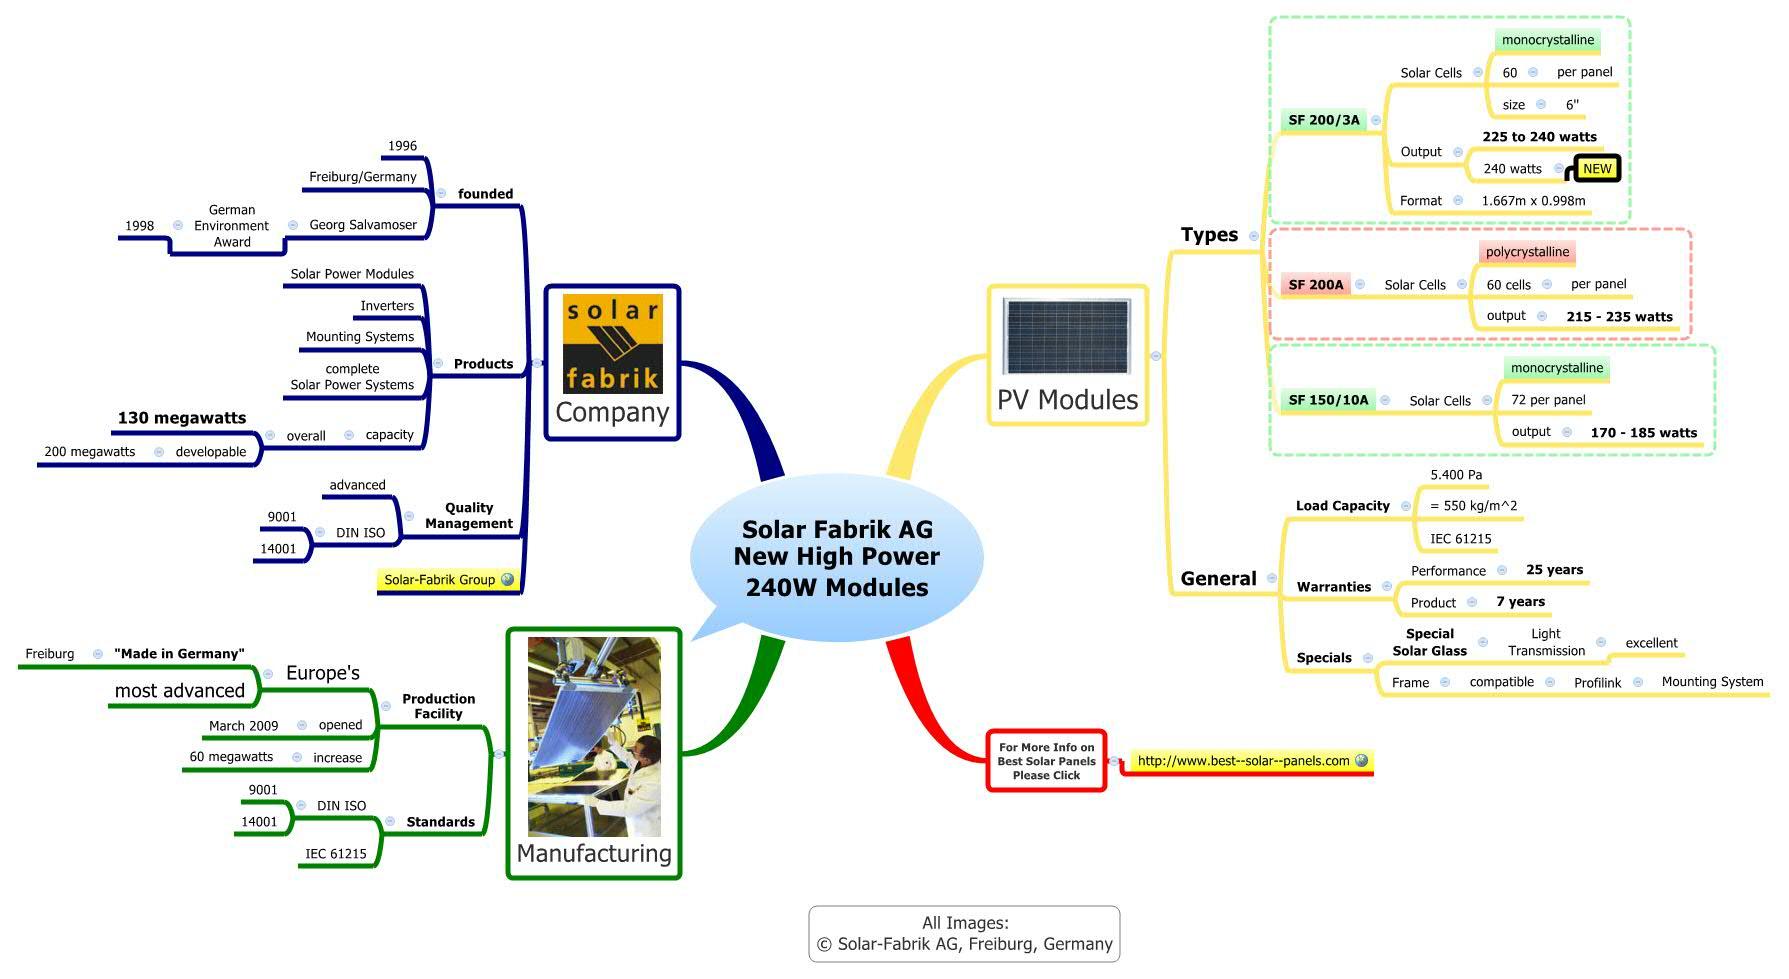 Solar Fabrik Ag New High Power 240w Modules Xmind Mind